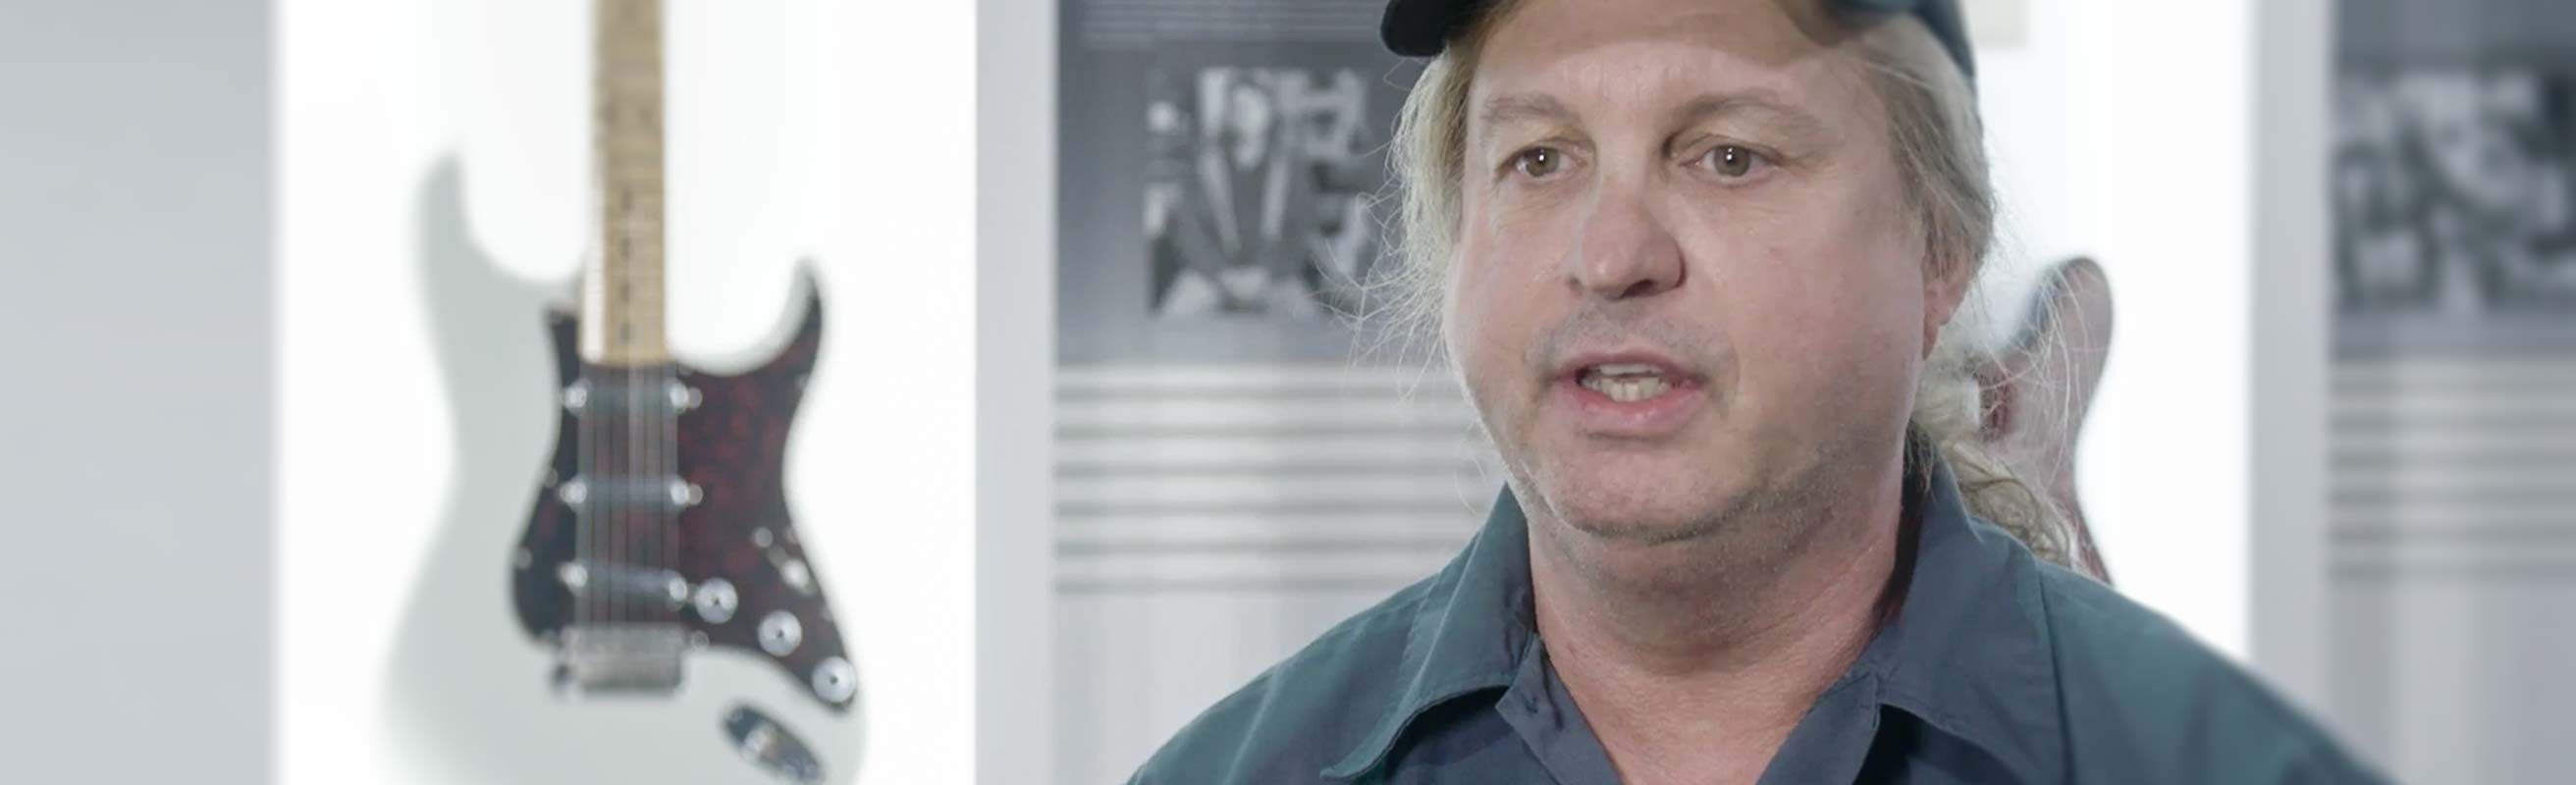 Master Builder Greg Fessler On His Texas Special Strat